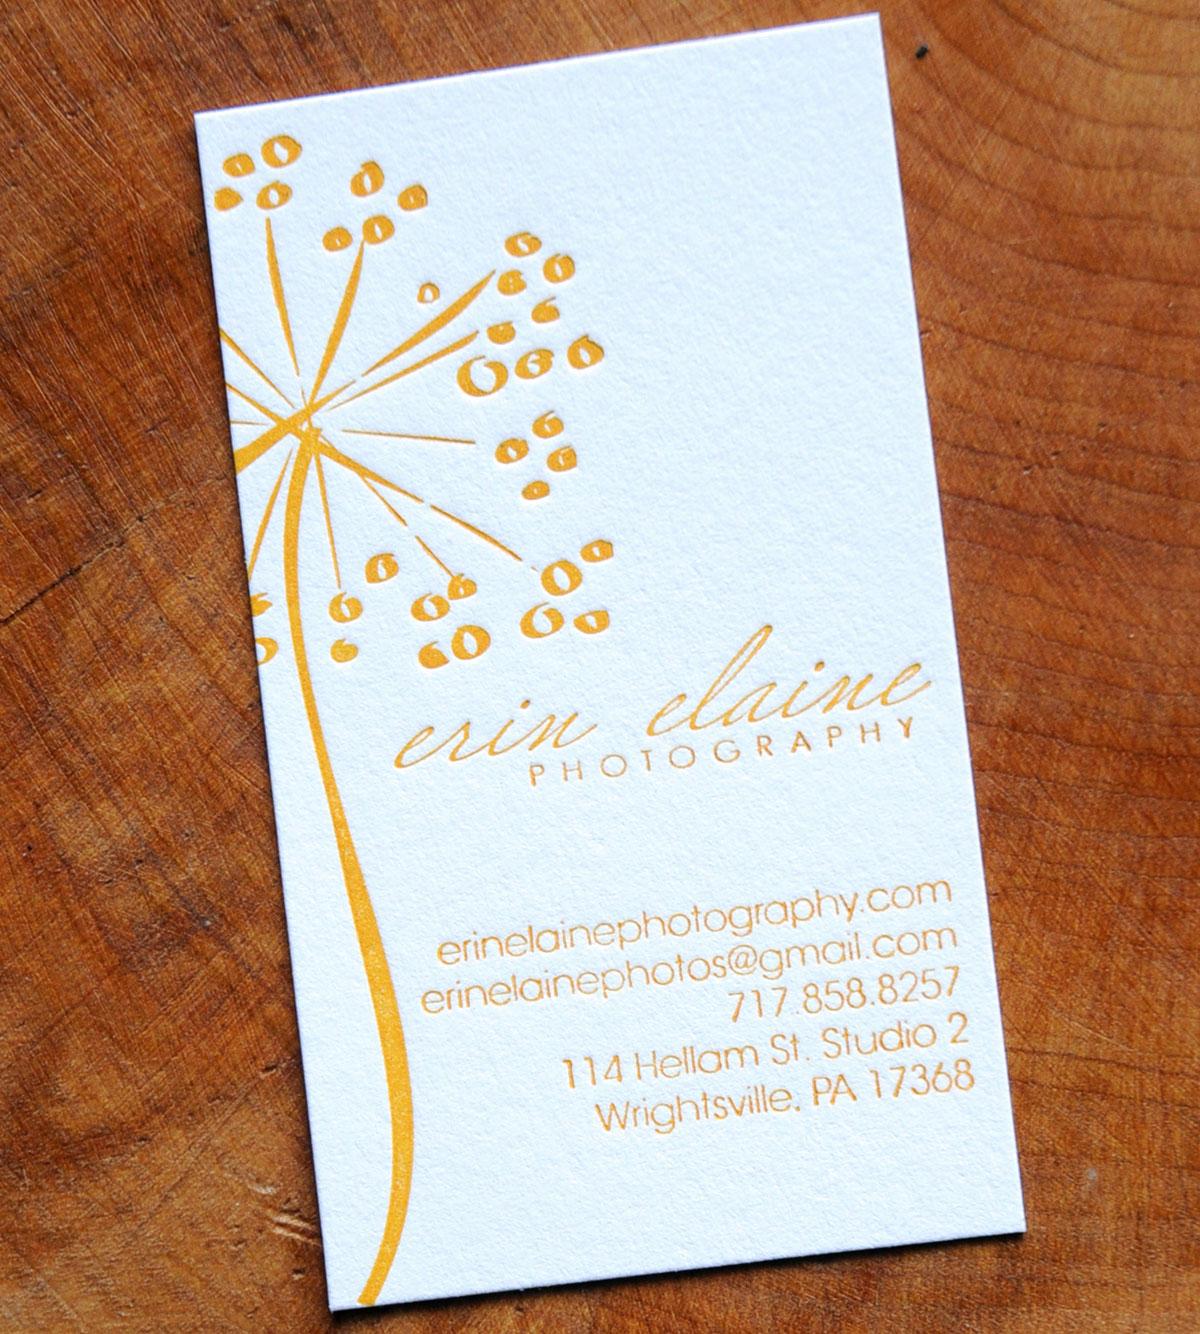 Custom letterpress business cards 622 press letterpress goods ee7852 colourmoves